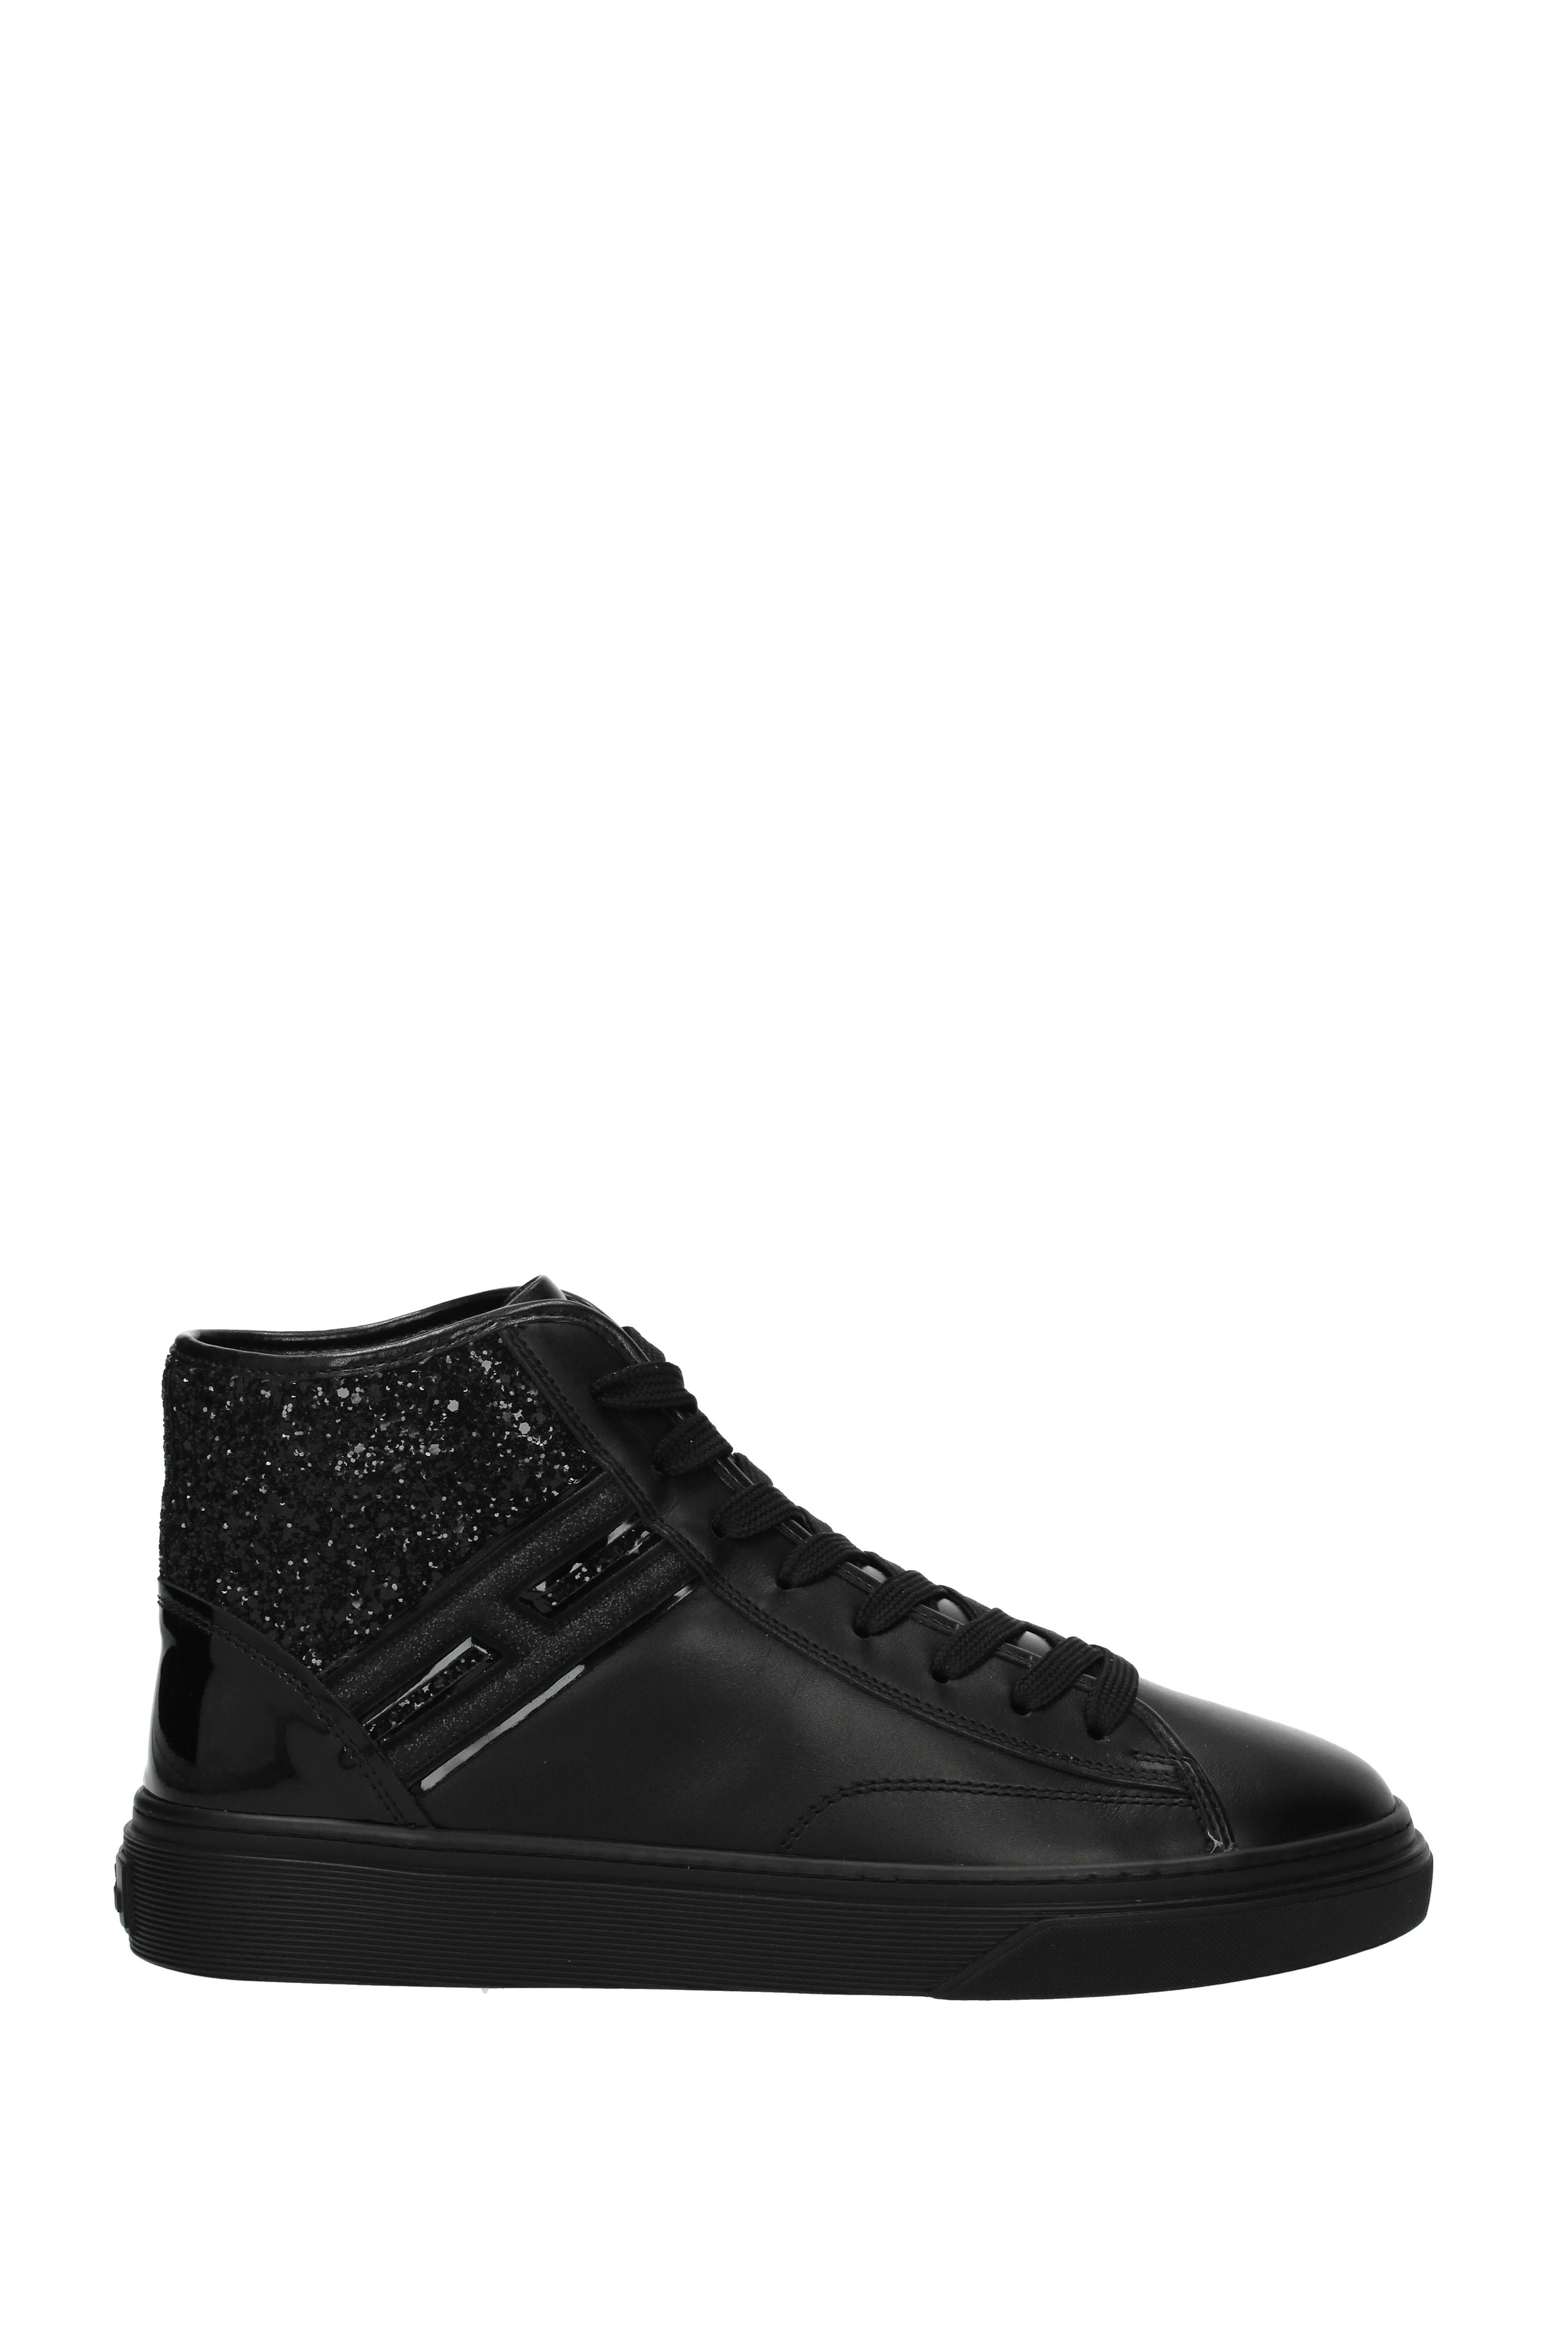 Sneakers Hogan Damens - Leder (HXW3420J230HSA) (HXW3420J230HSA) Leder 3fea55